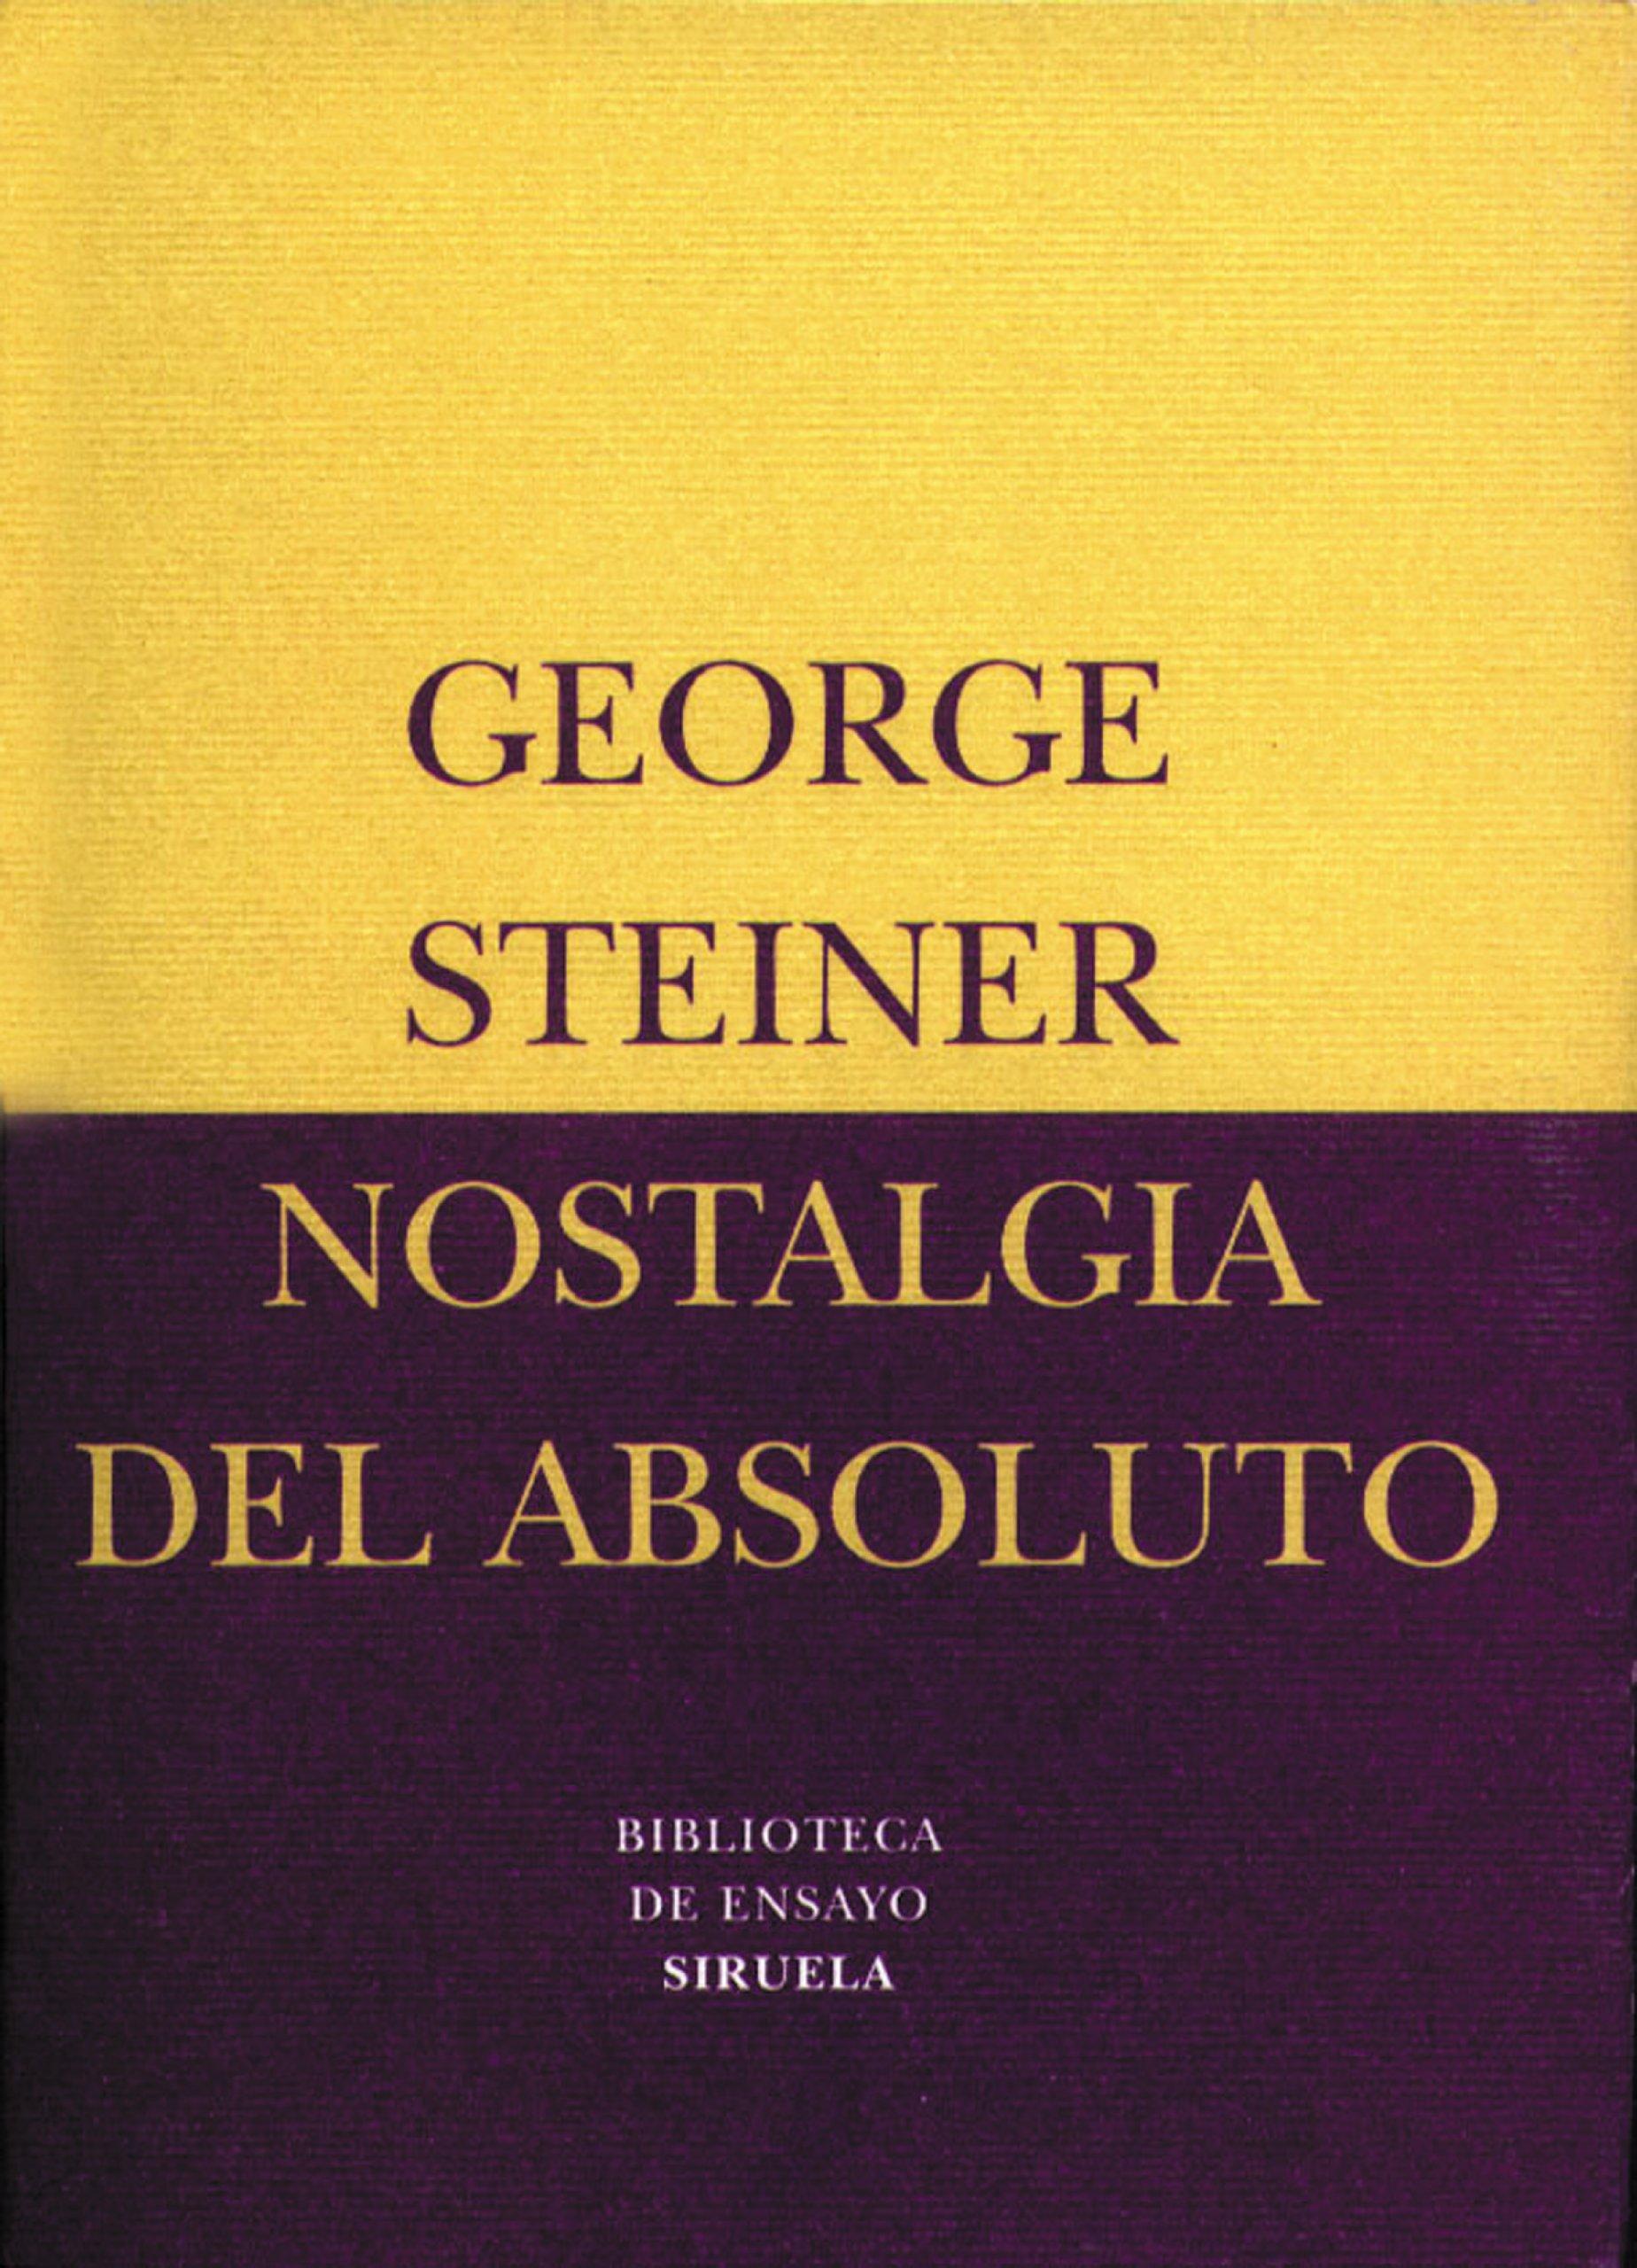 Nostalgia del absoluto (Biblioteca de Ensayo / Serie menor) Tapa blanda – 19 sep 2016 George Steiner María Tabuyo Agustín López Siruela